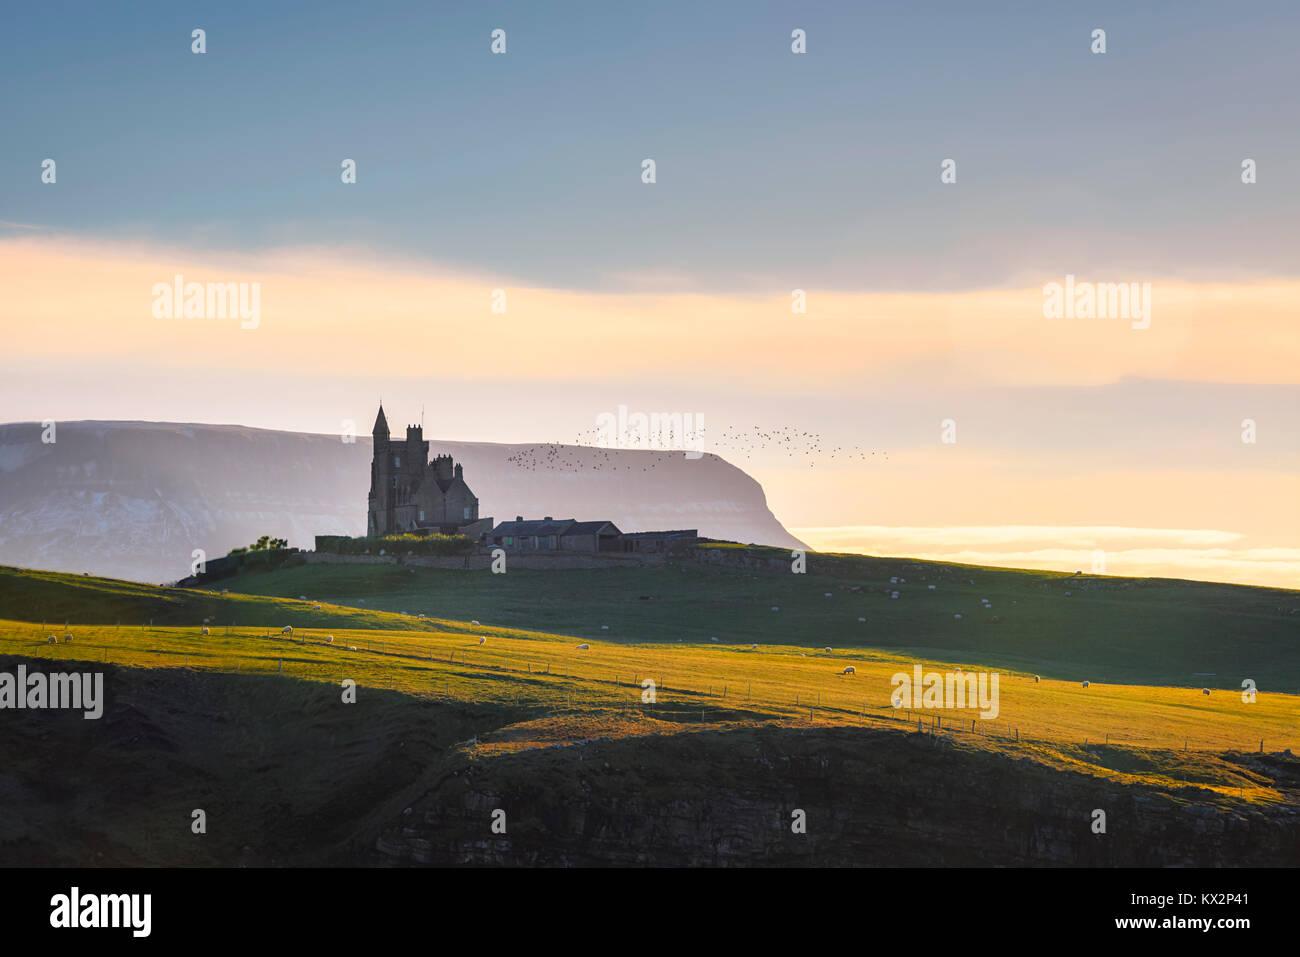 Classiebawn Castle in Sligo - Ireland - Stock Image